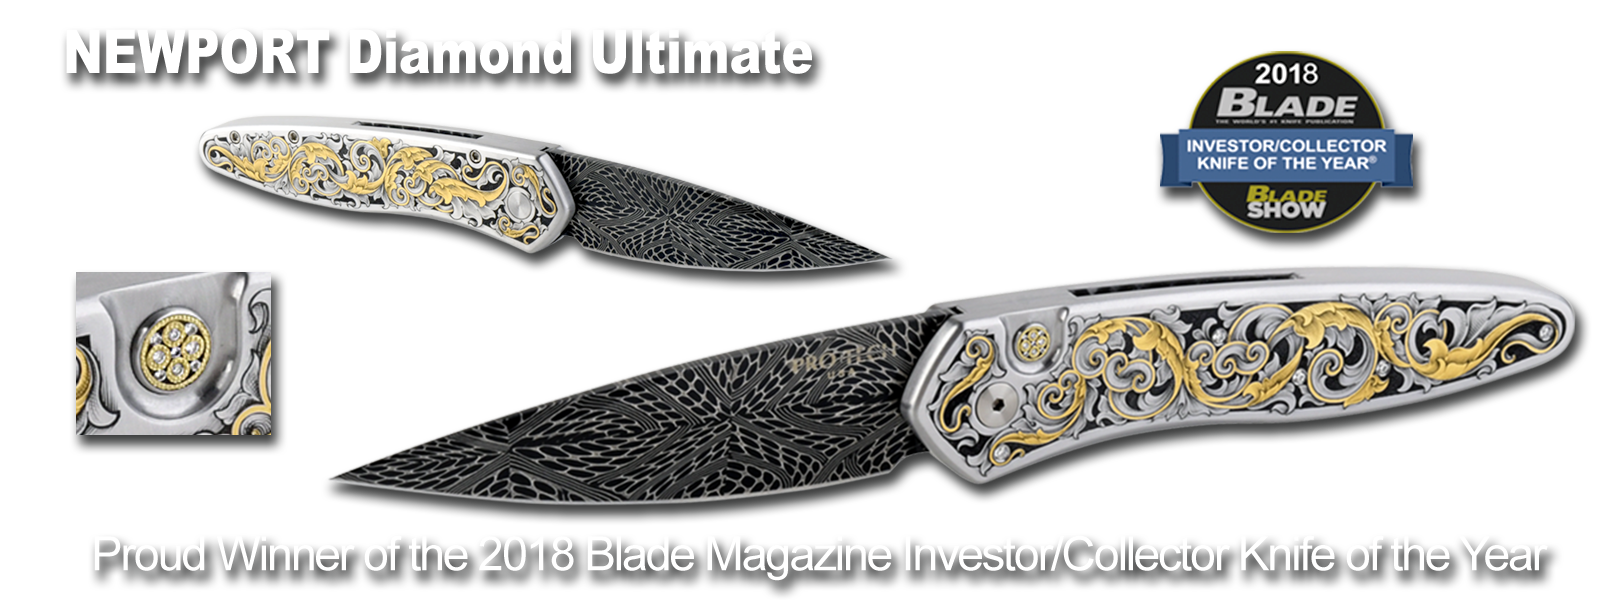 Banner-2018 Blade show winner-complete